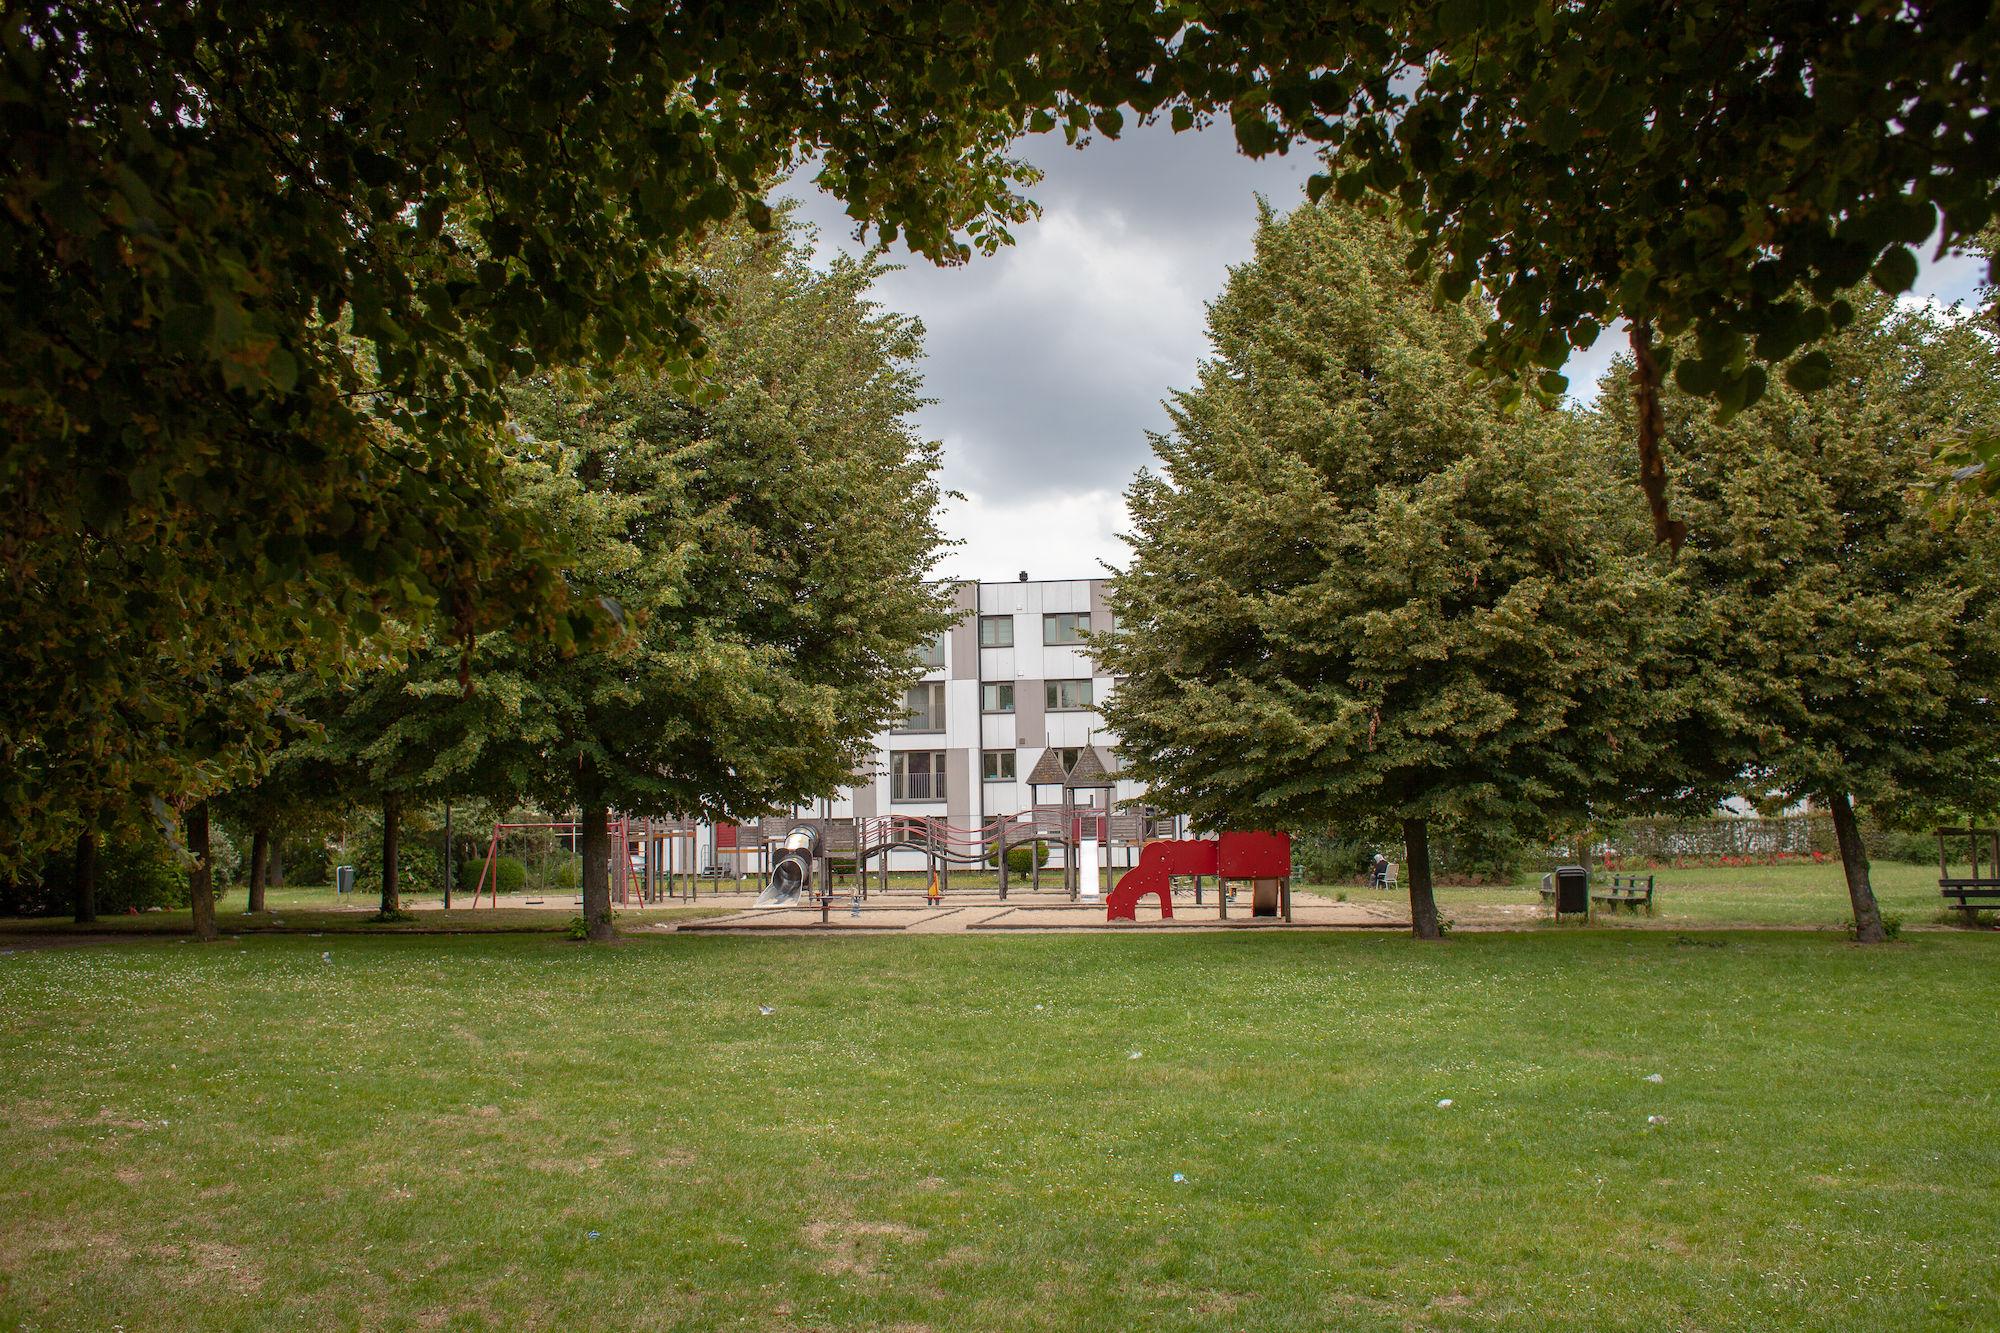 2019-07-02 Muide Meulestede prospectie Wannes_stadsvernieuwing_IMG_0348-3.jpg